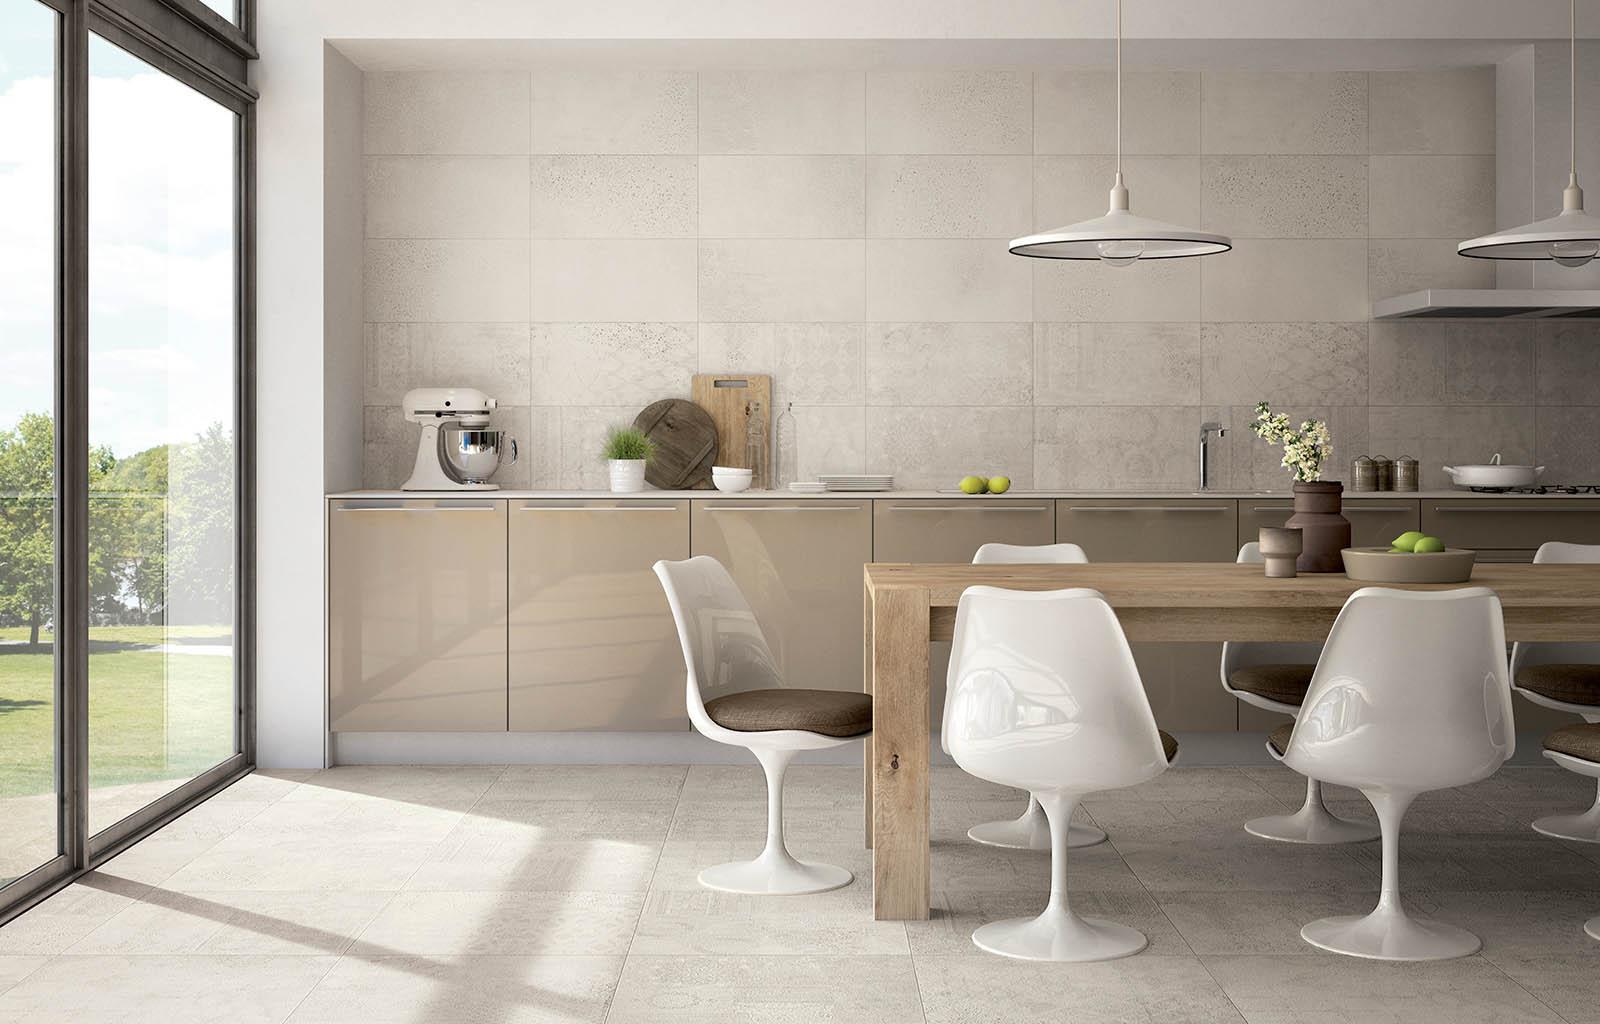 Kitchen Tiles Malta downtown - bathroom design malta